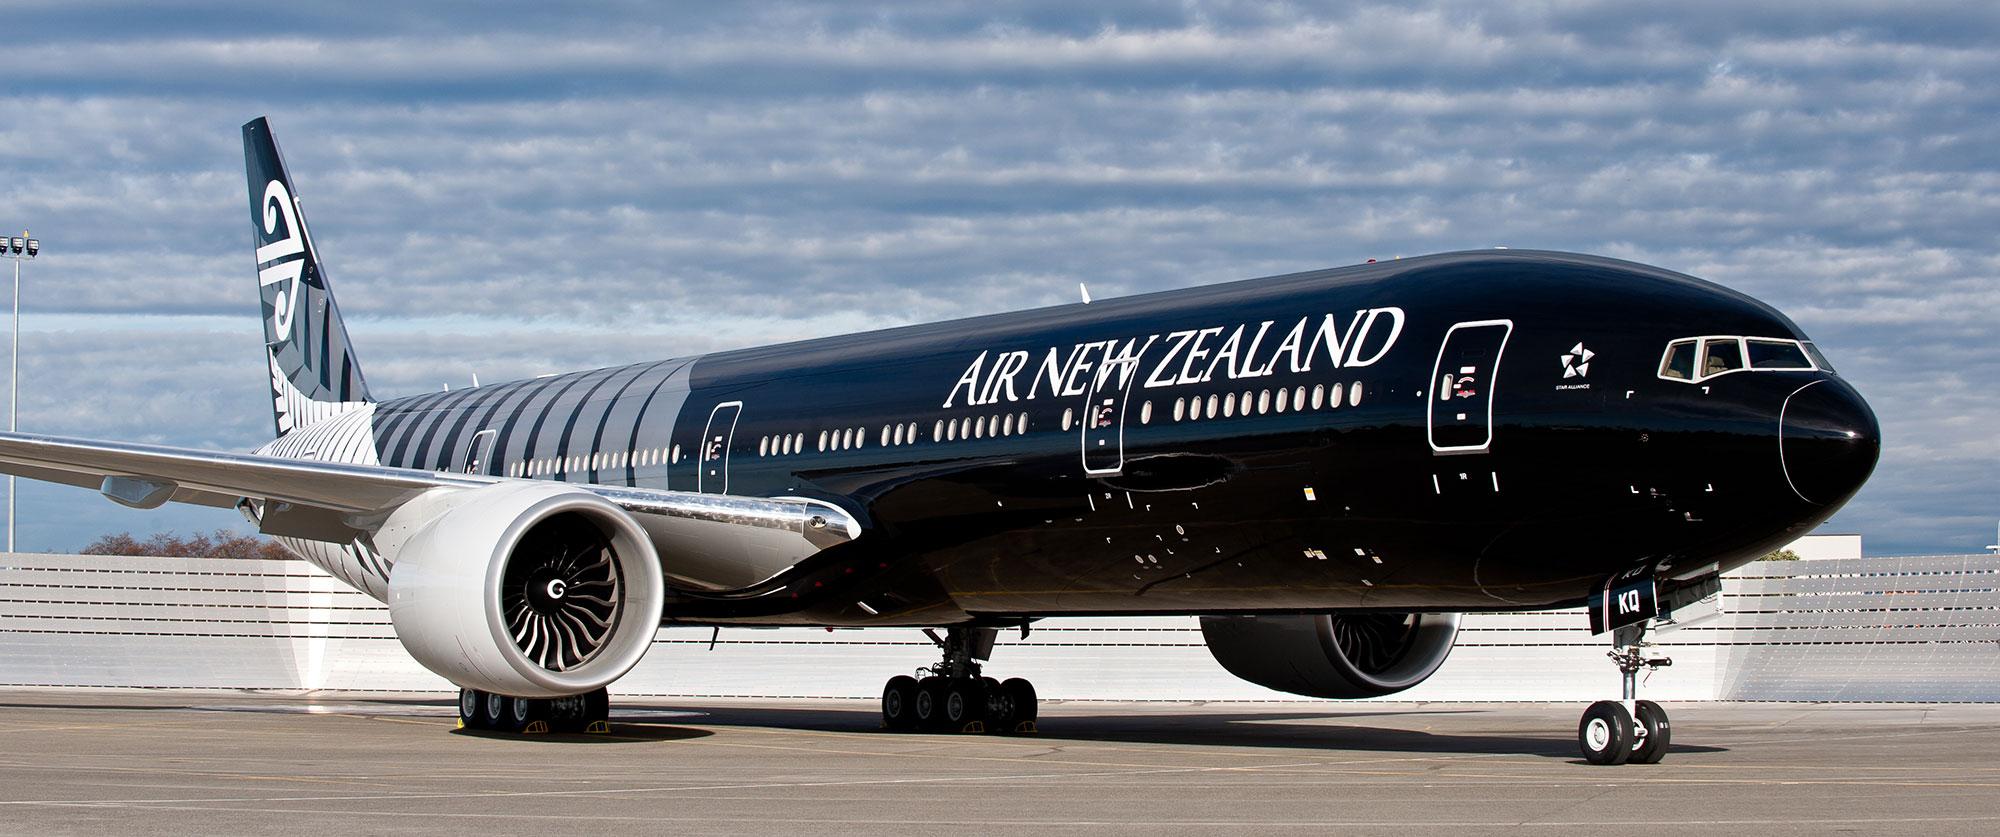 Air New Zealand - black plane exterior